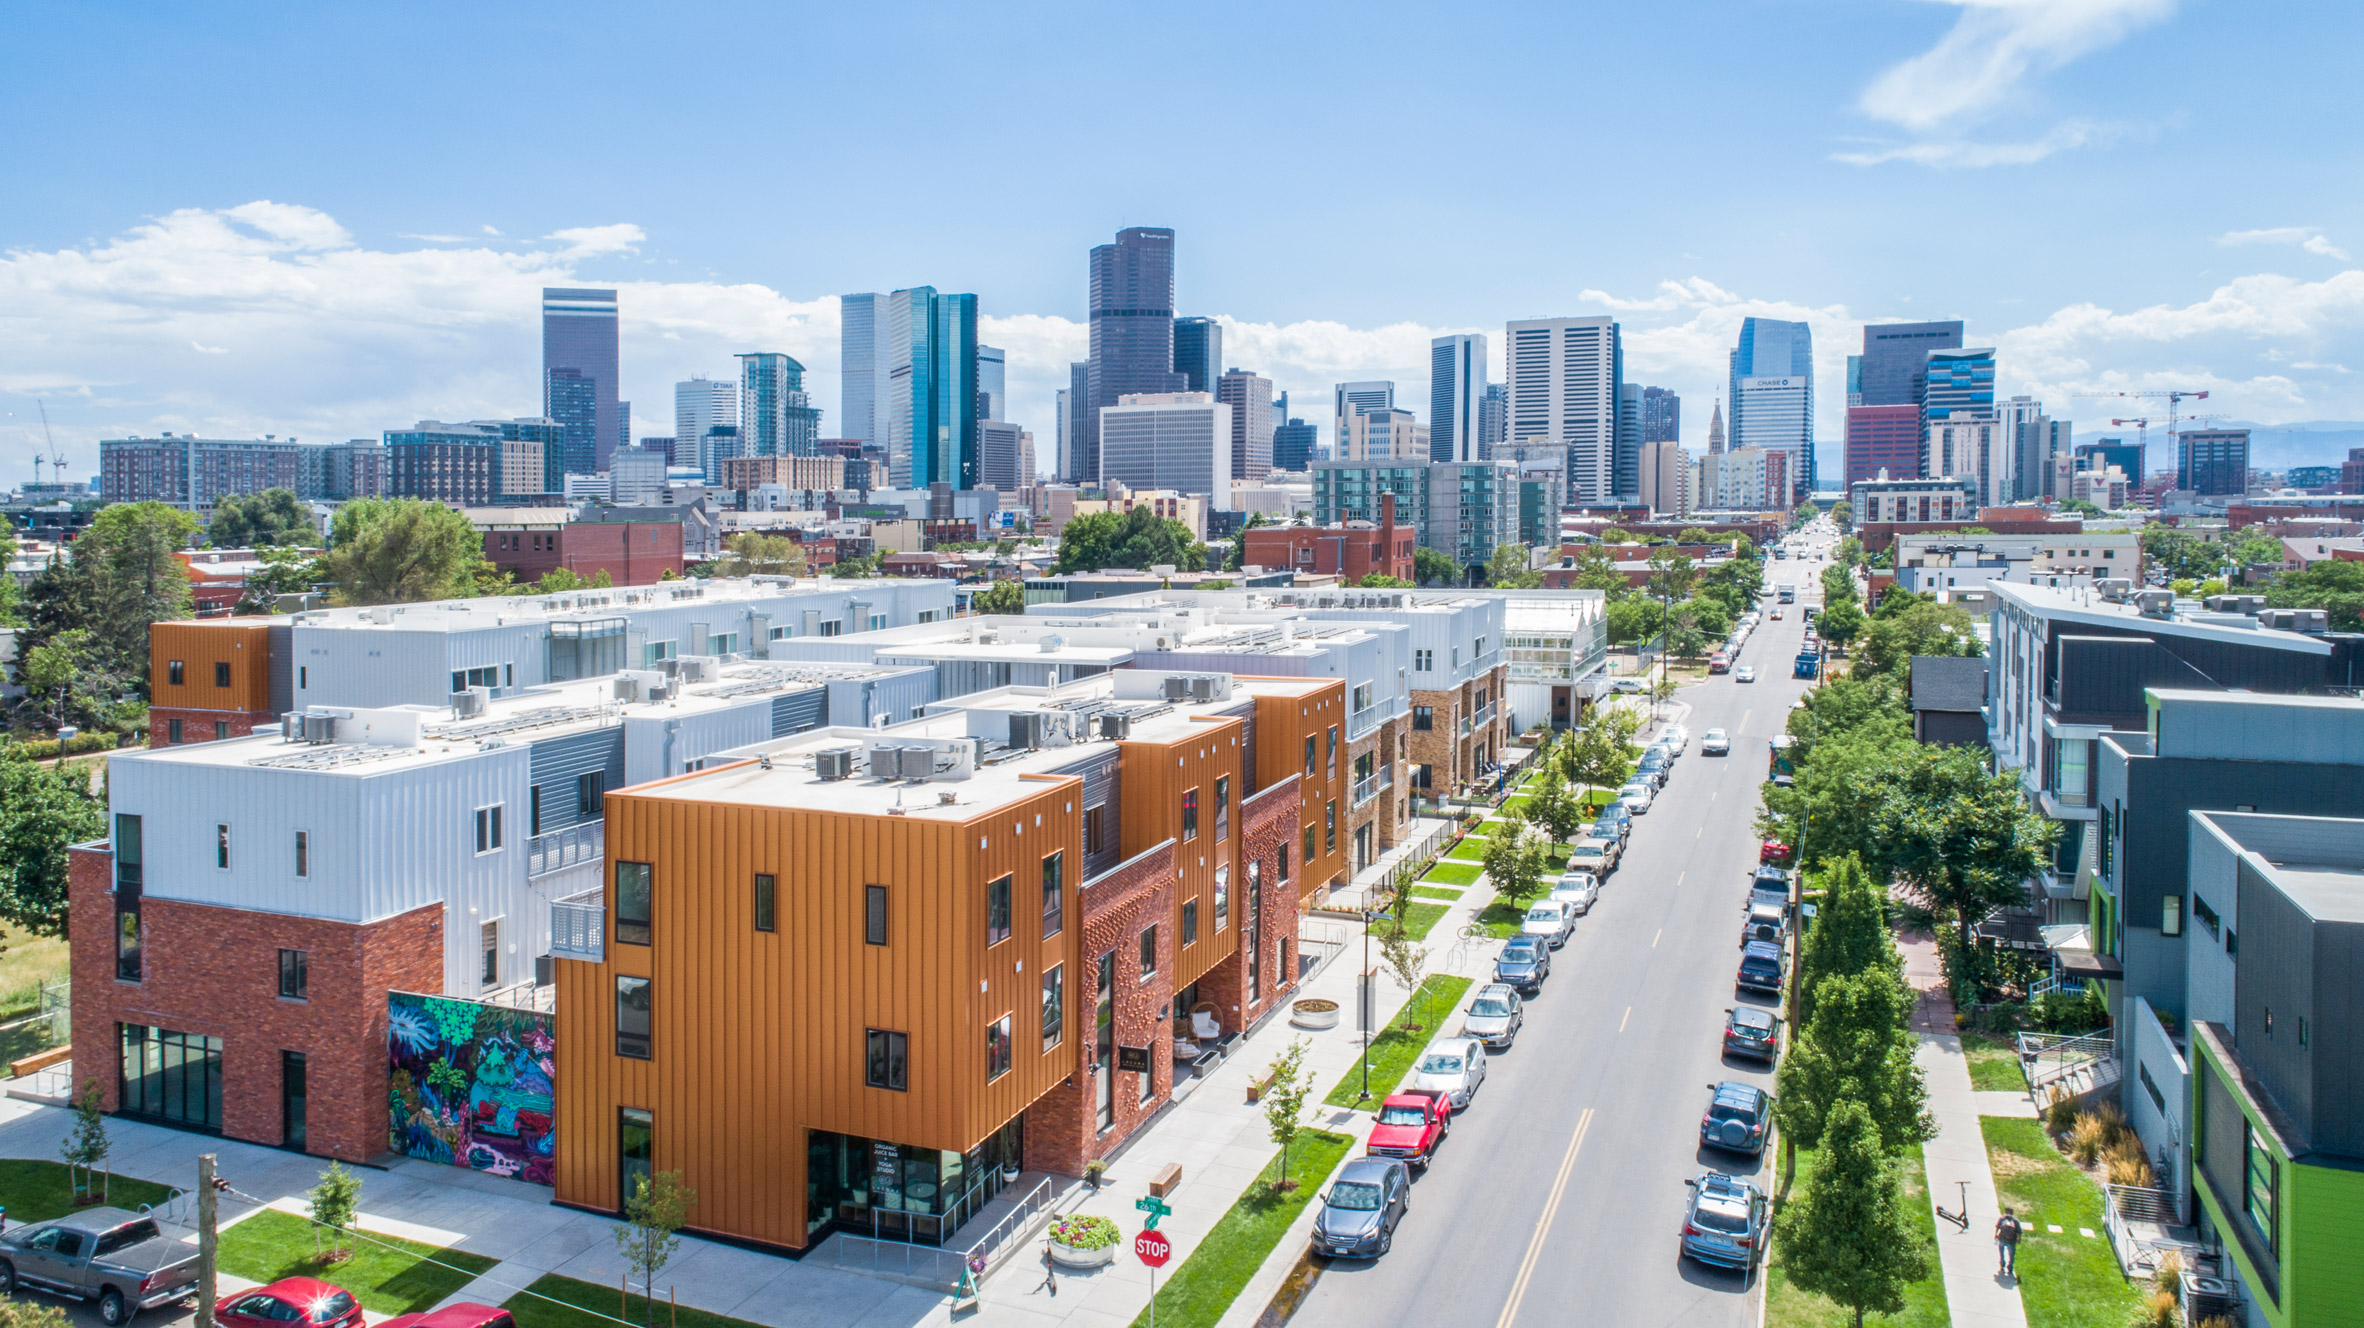 S*PARK by Tres Birds occupies full city block in Denver